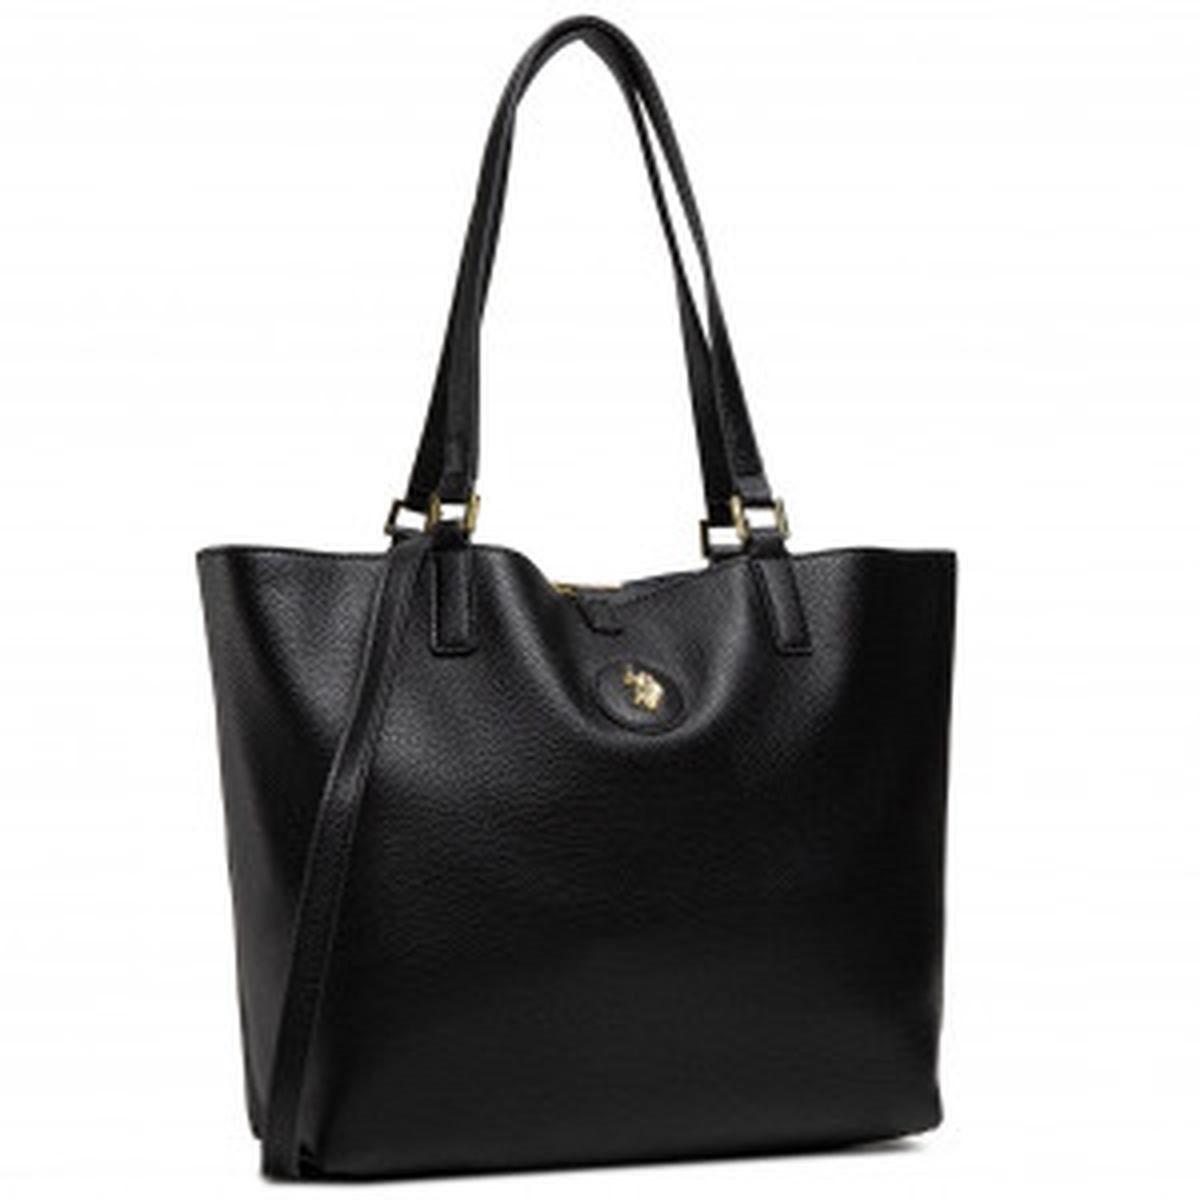 US Polo Assn. Τσάντα χειρός 3in1 28x14x27cm Malibu Black